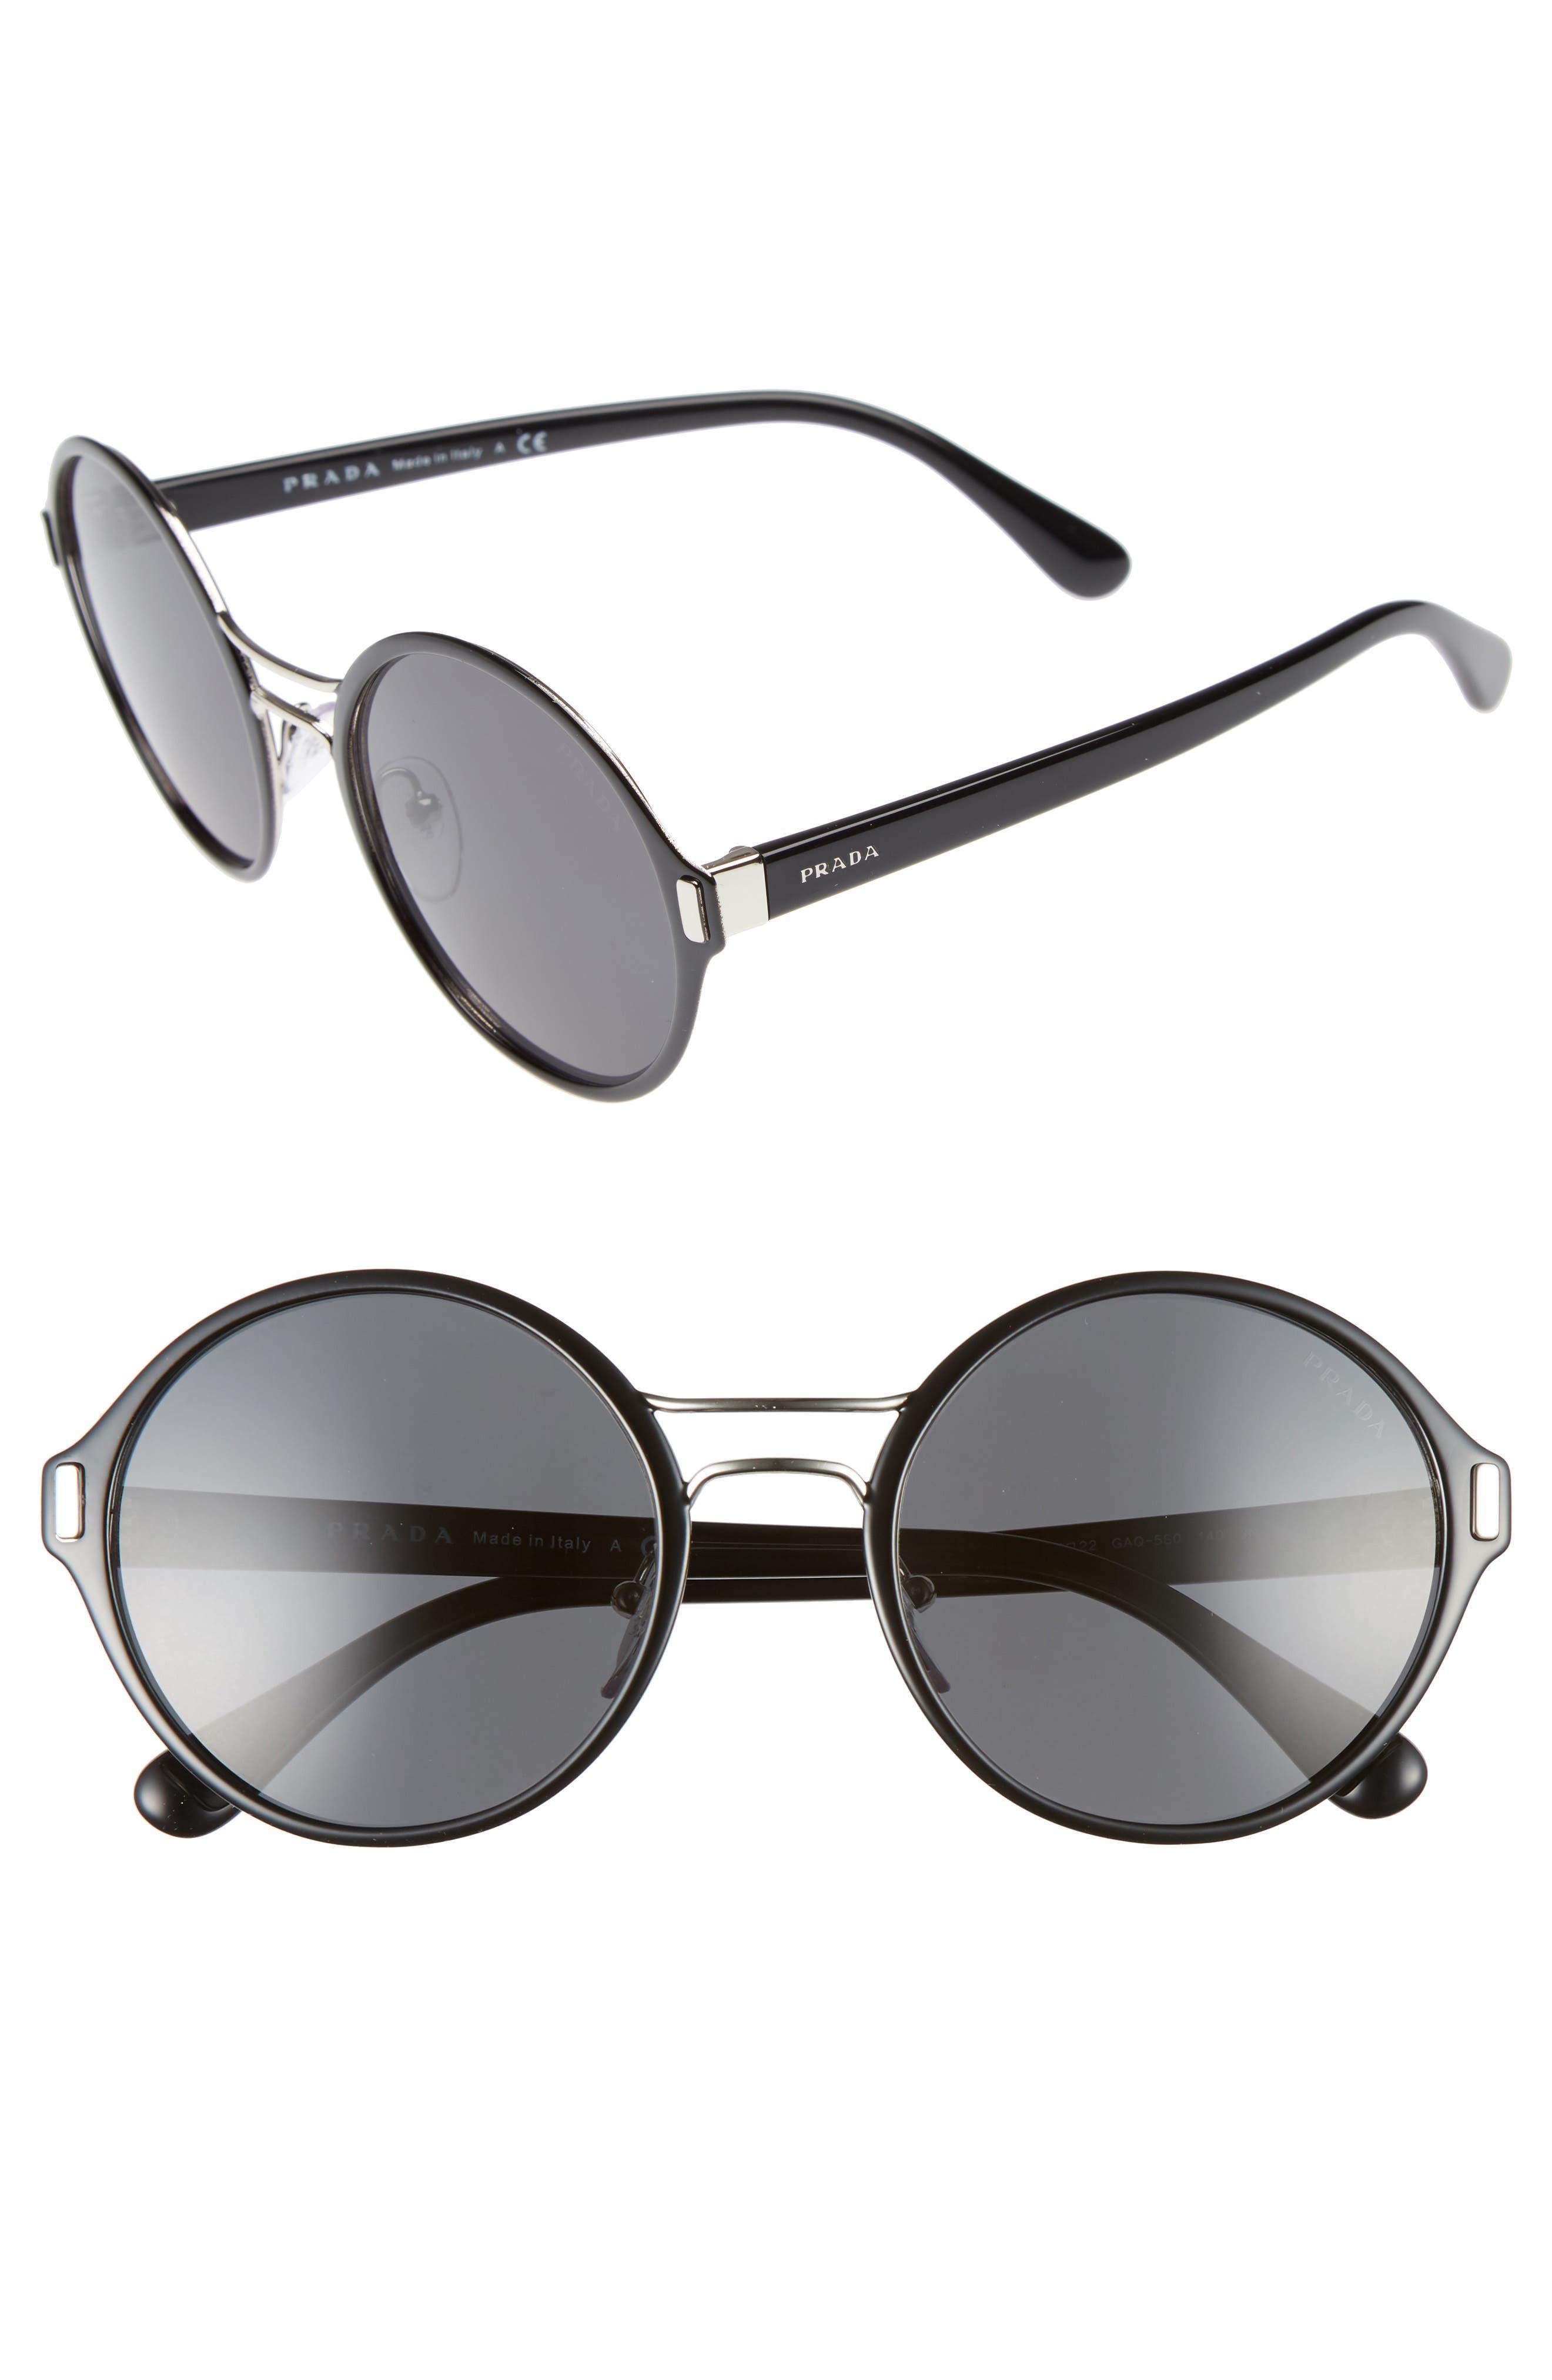 Alternate Image 1 Selected - Prada 54mm Round Sunglasses